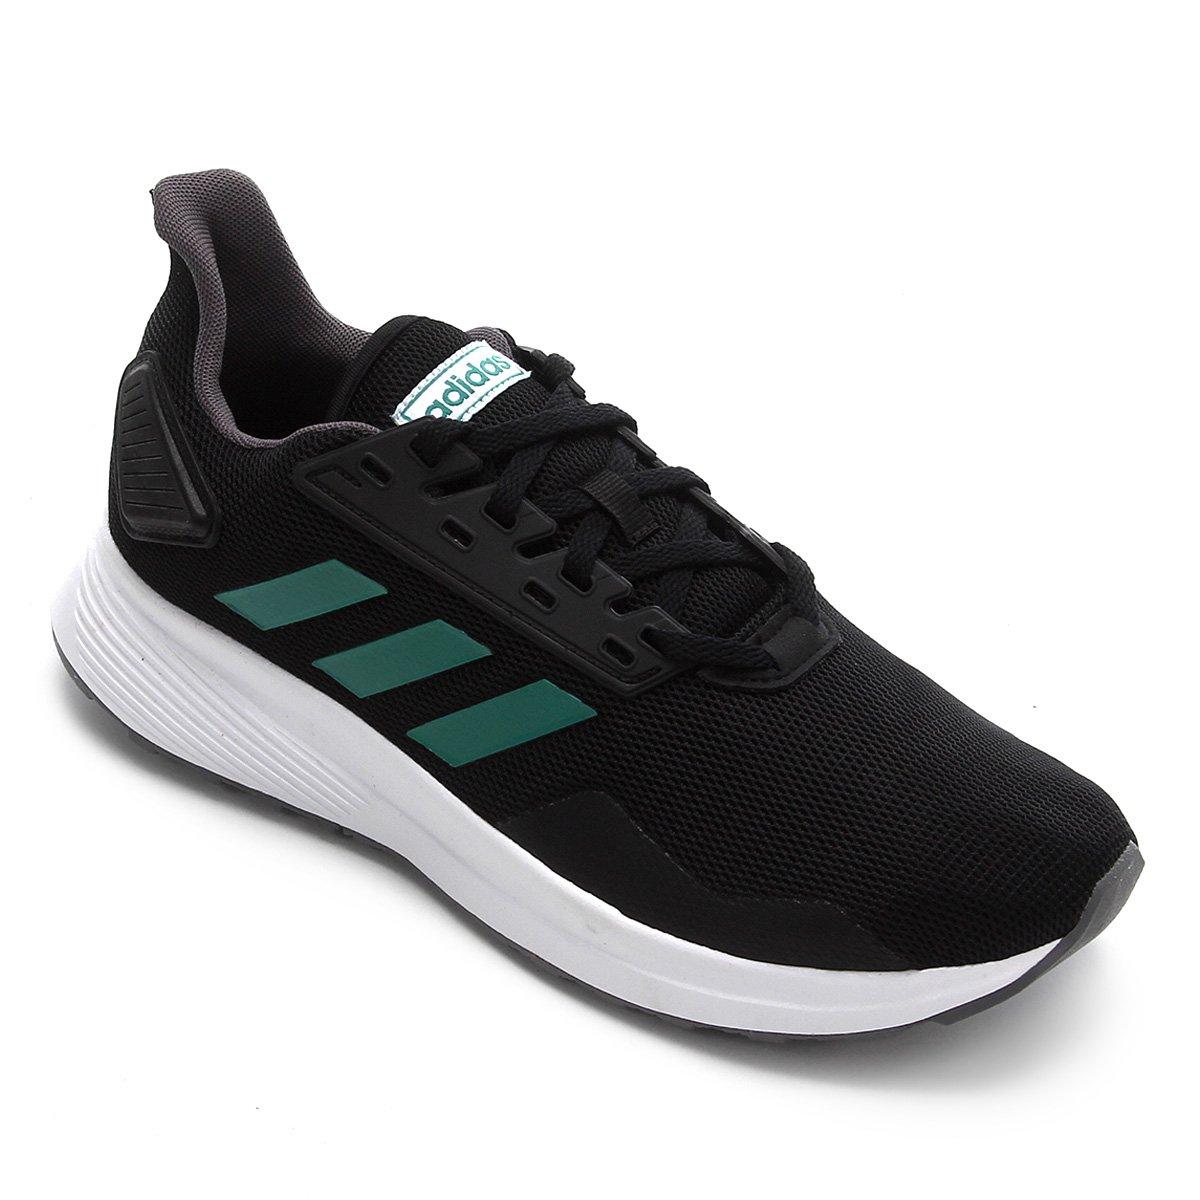 Tênis Adidas Duramo 9 Masculino - Tam: 44